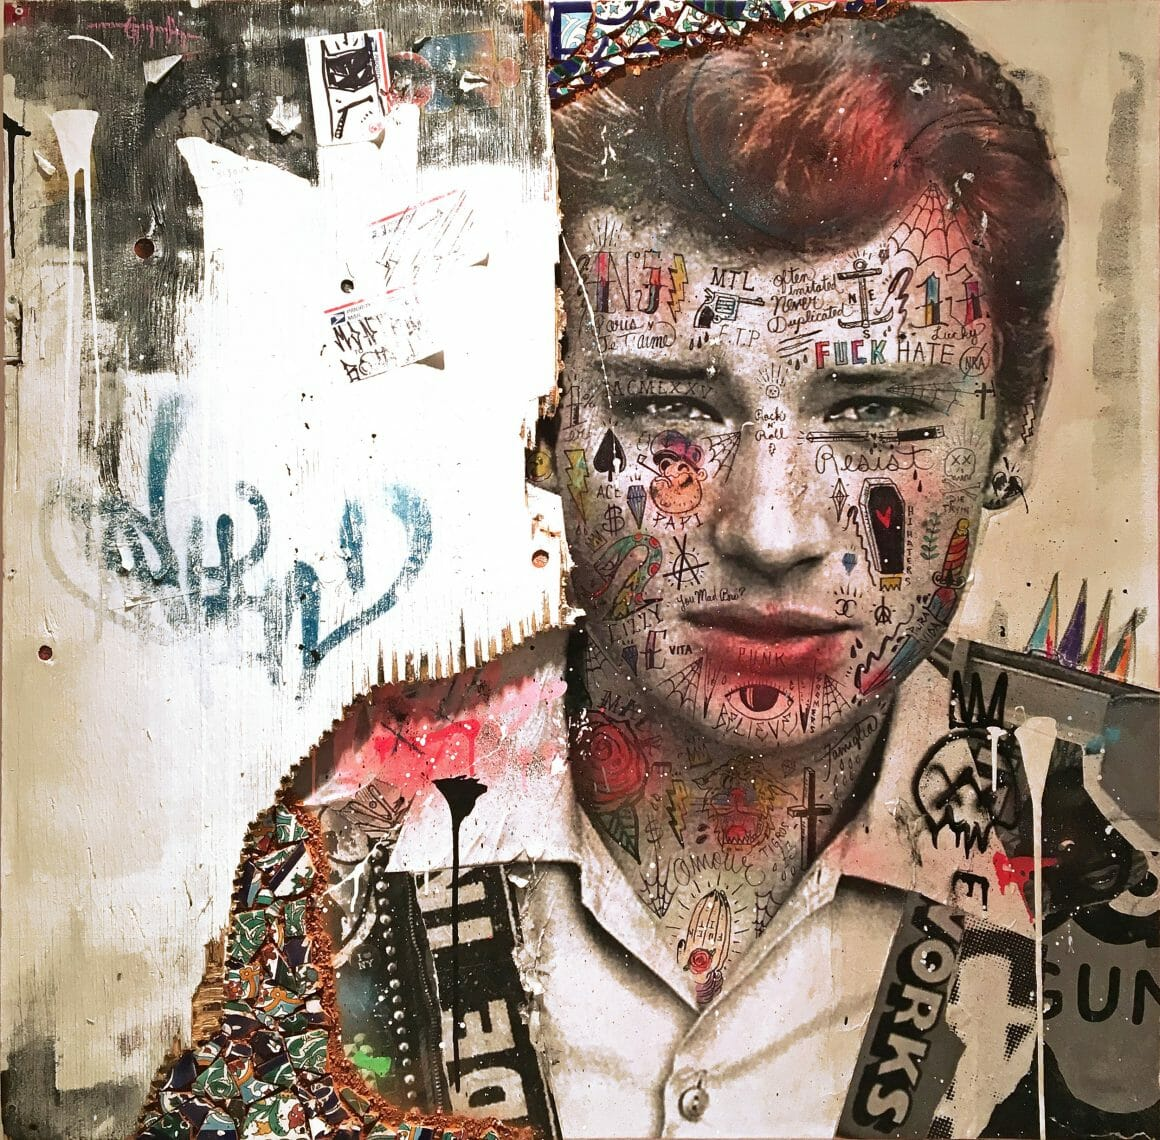 street art Johnny Hallyday